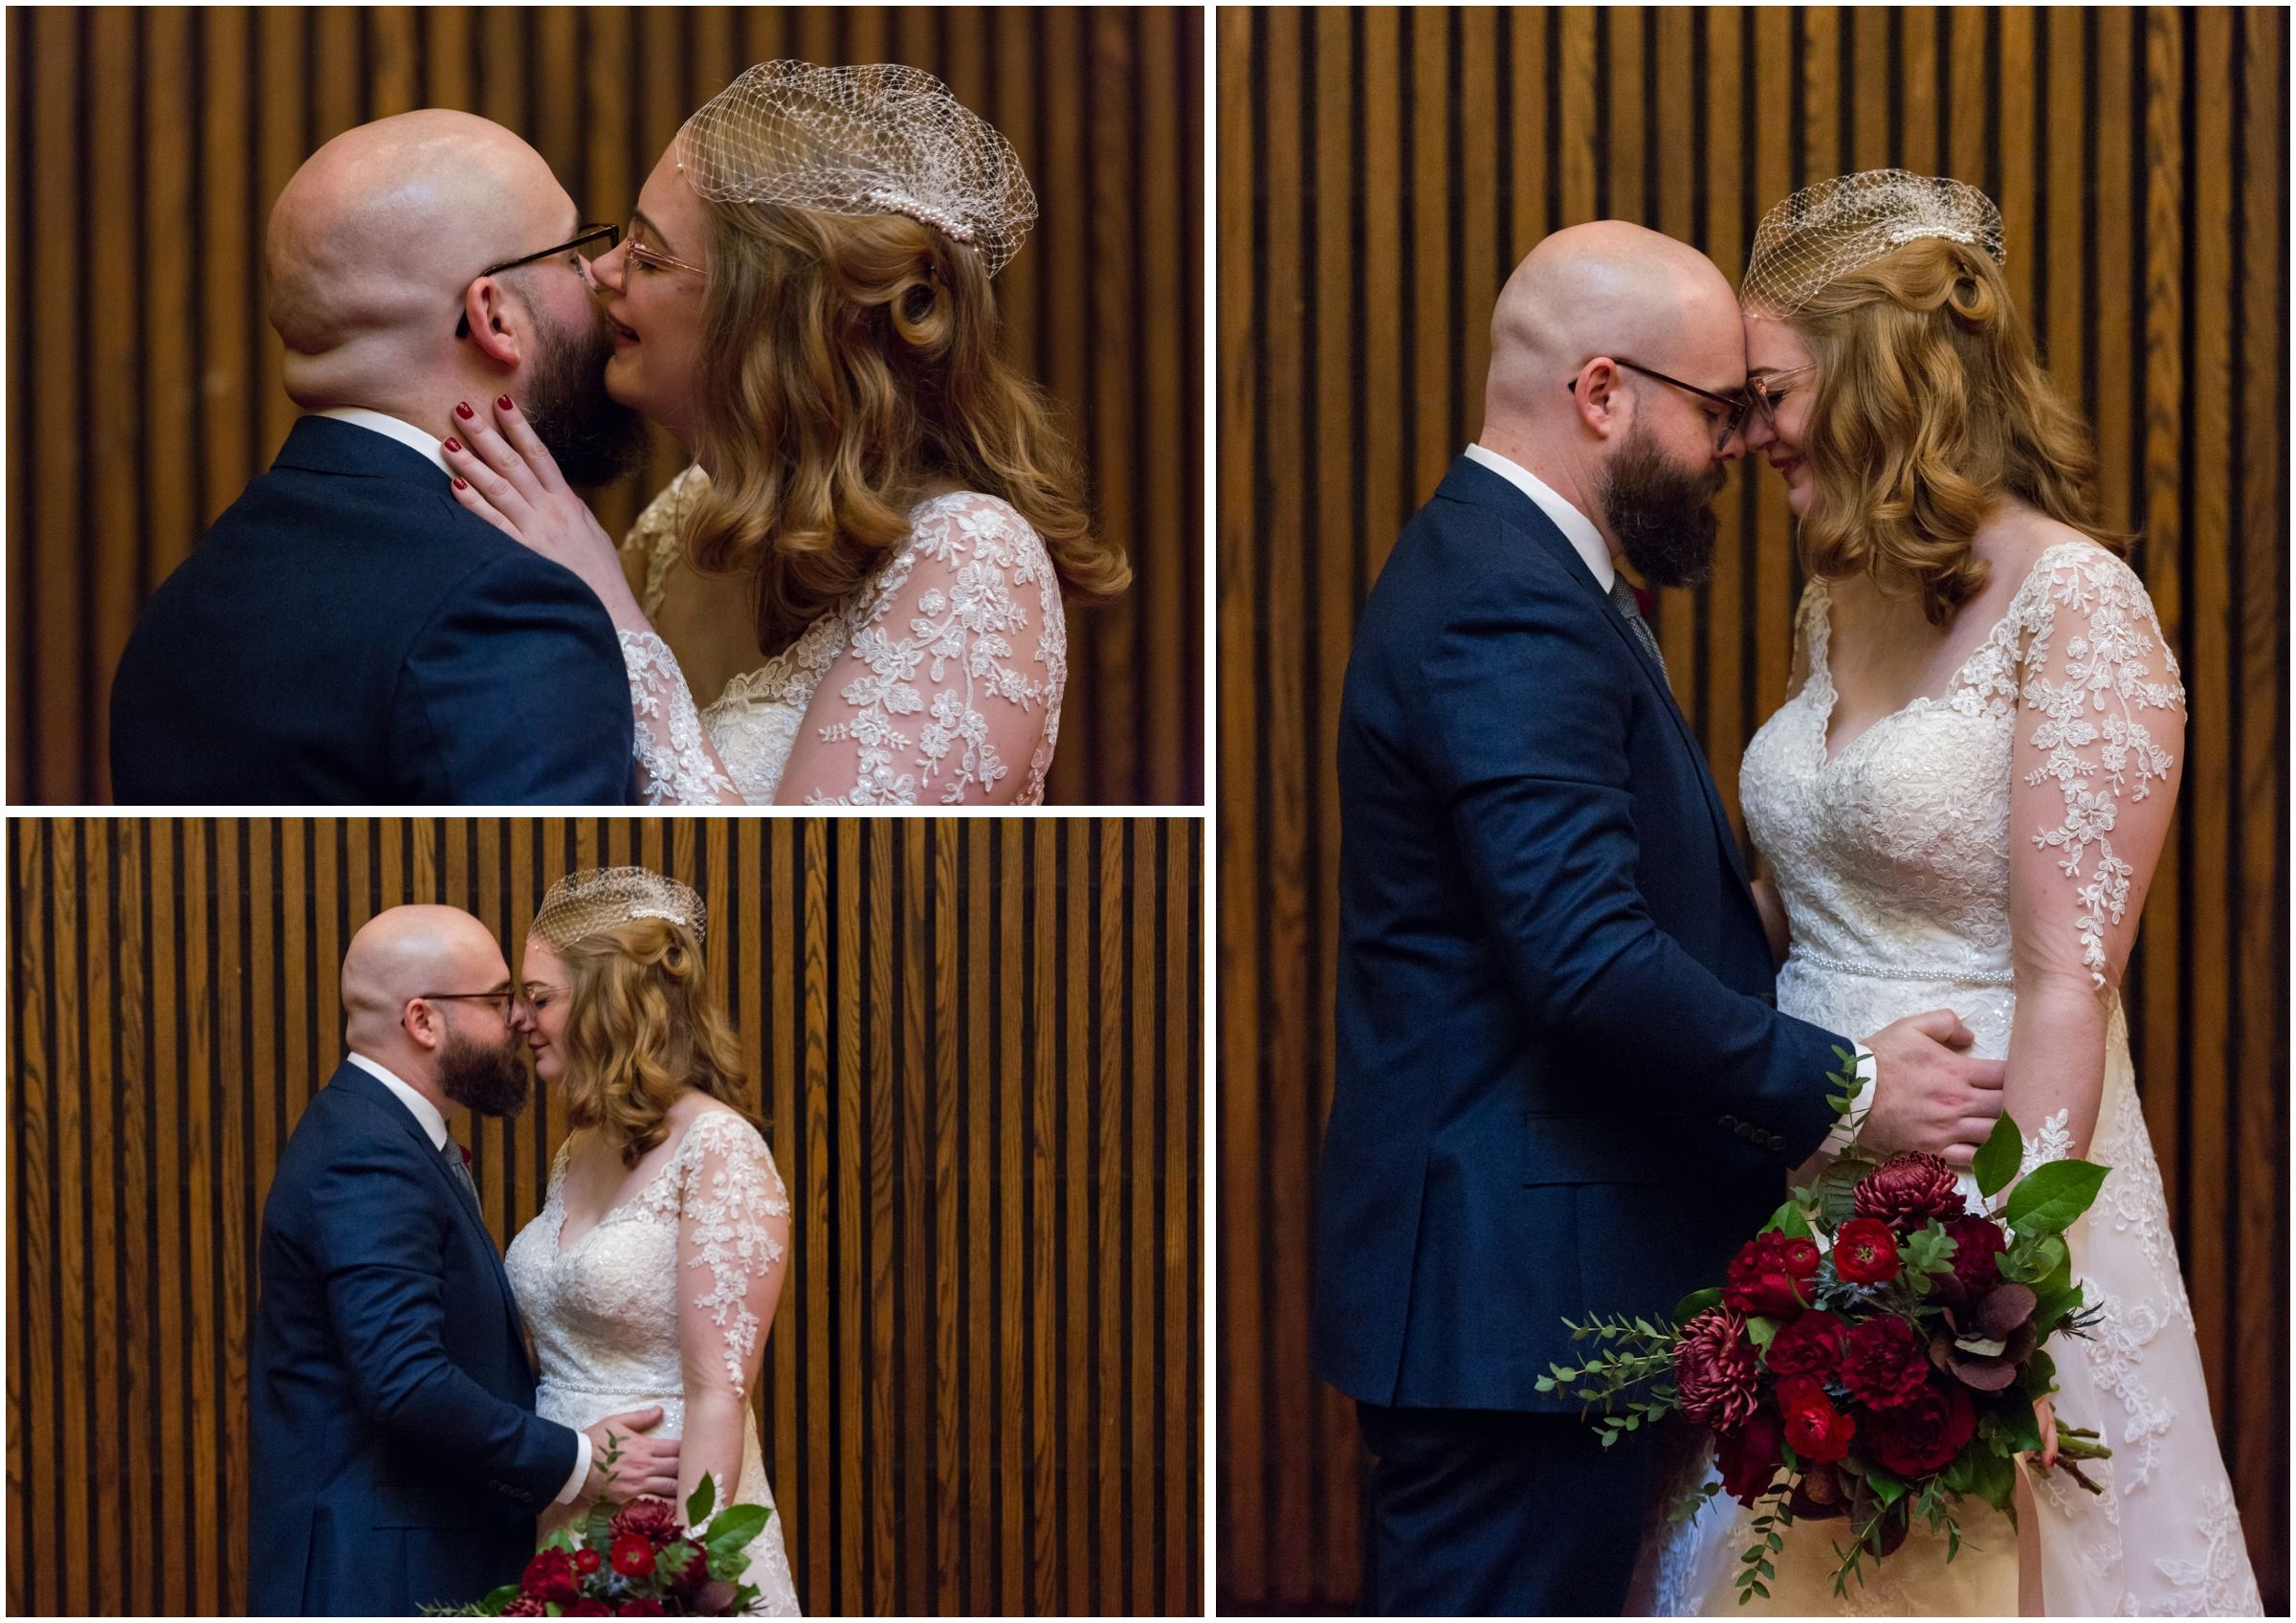 Ottaw Wedding Allison Andrew - (Selena Phillips-Boyle)_0035.jpg